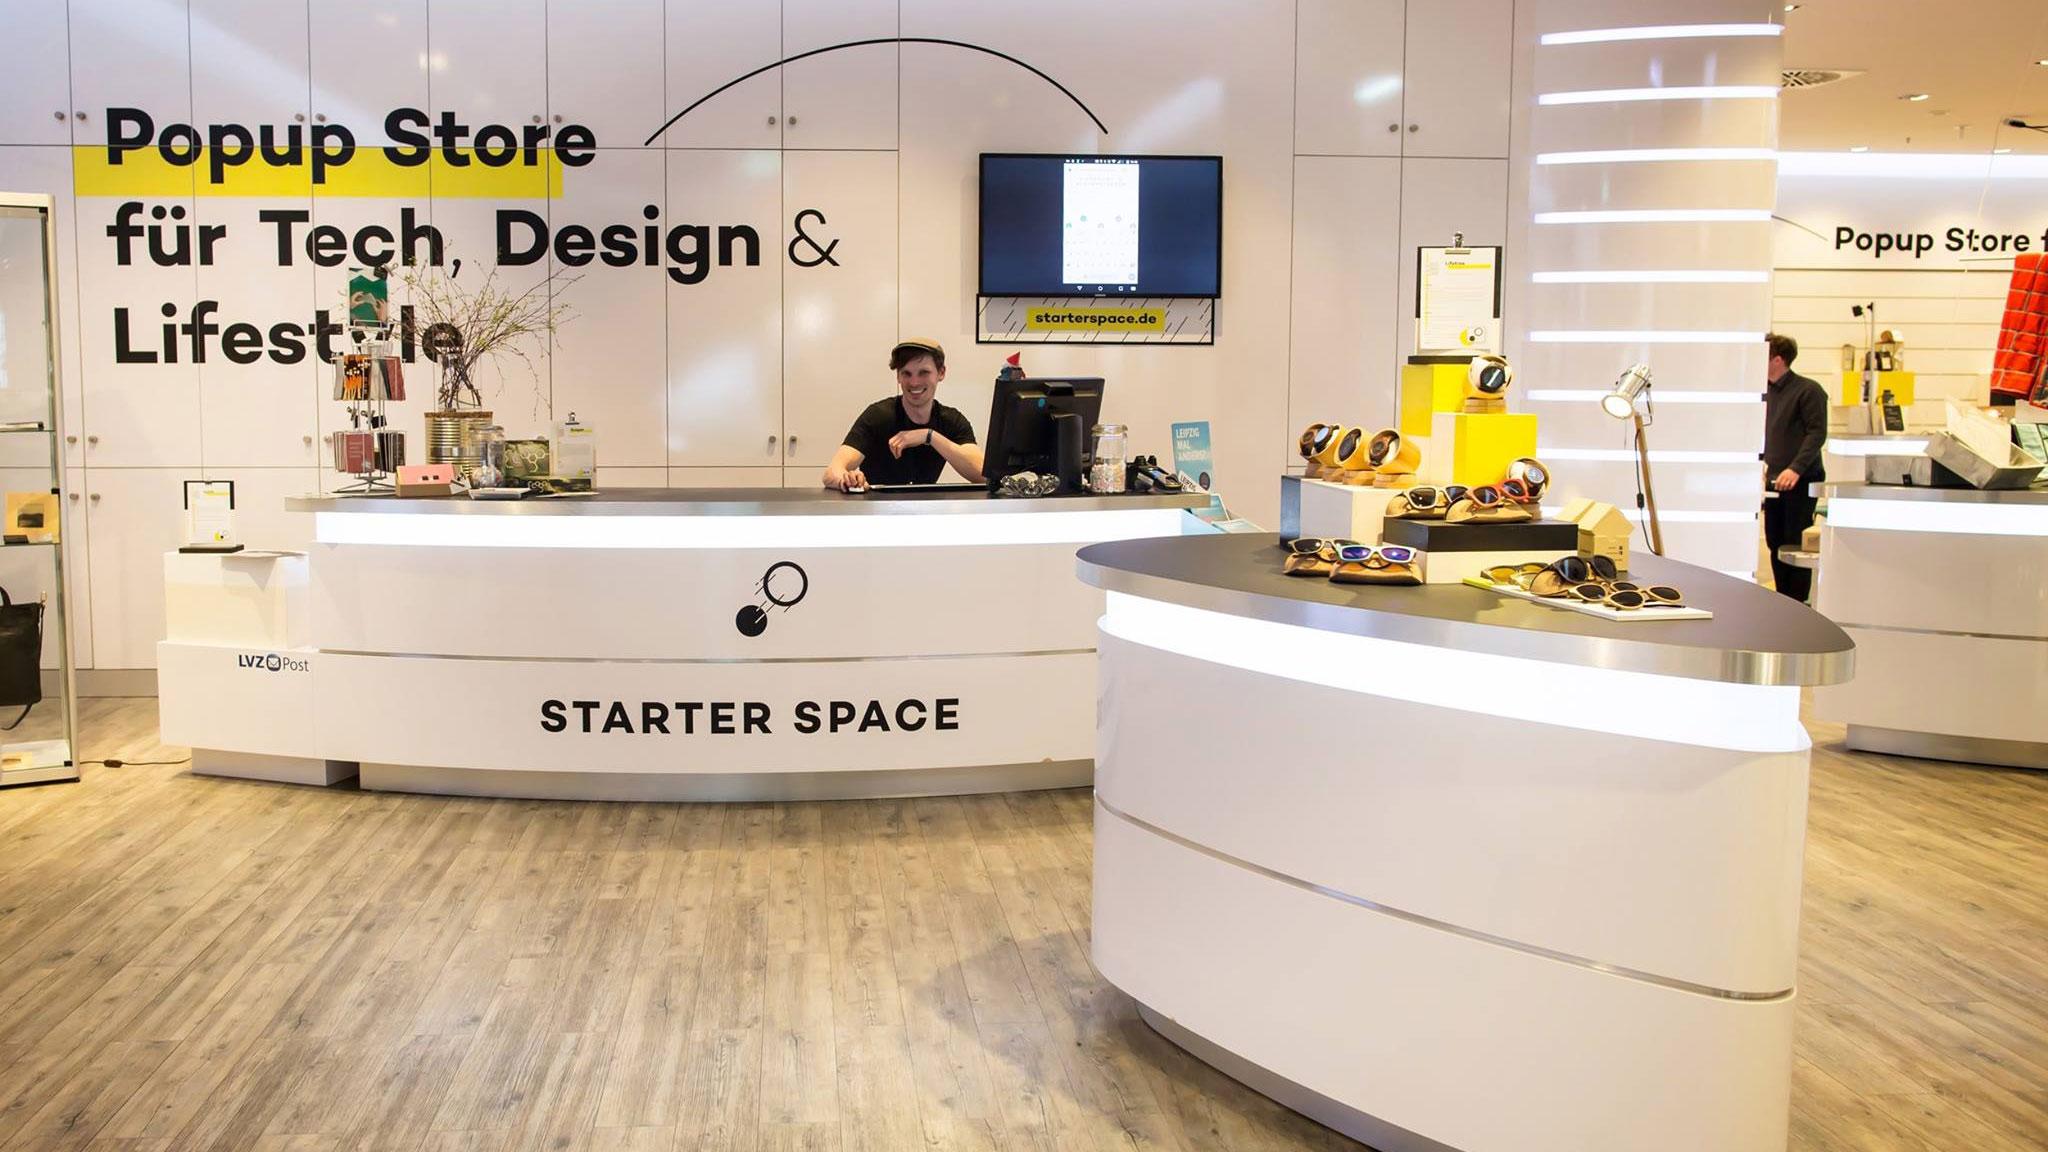 Starterspace